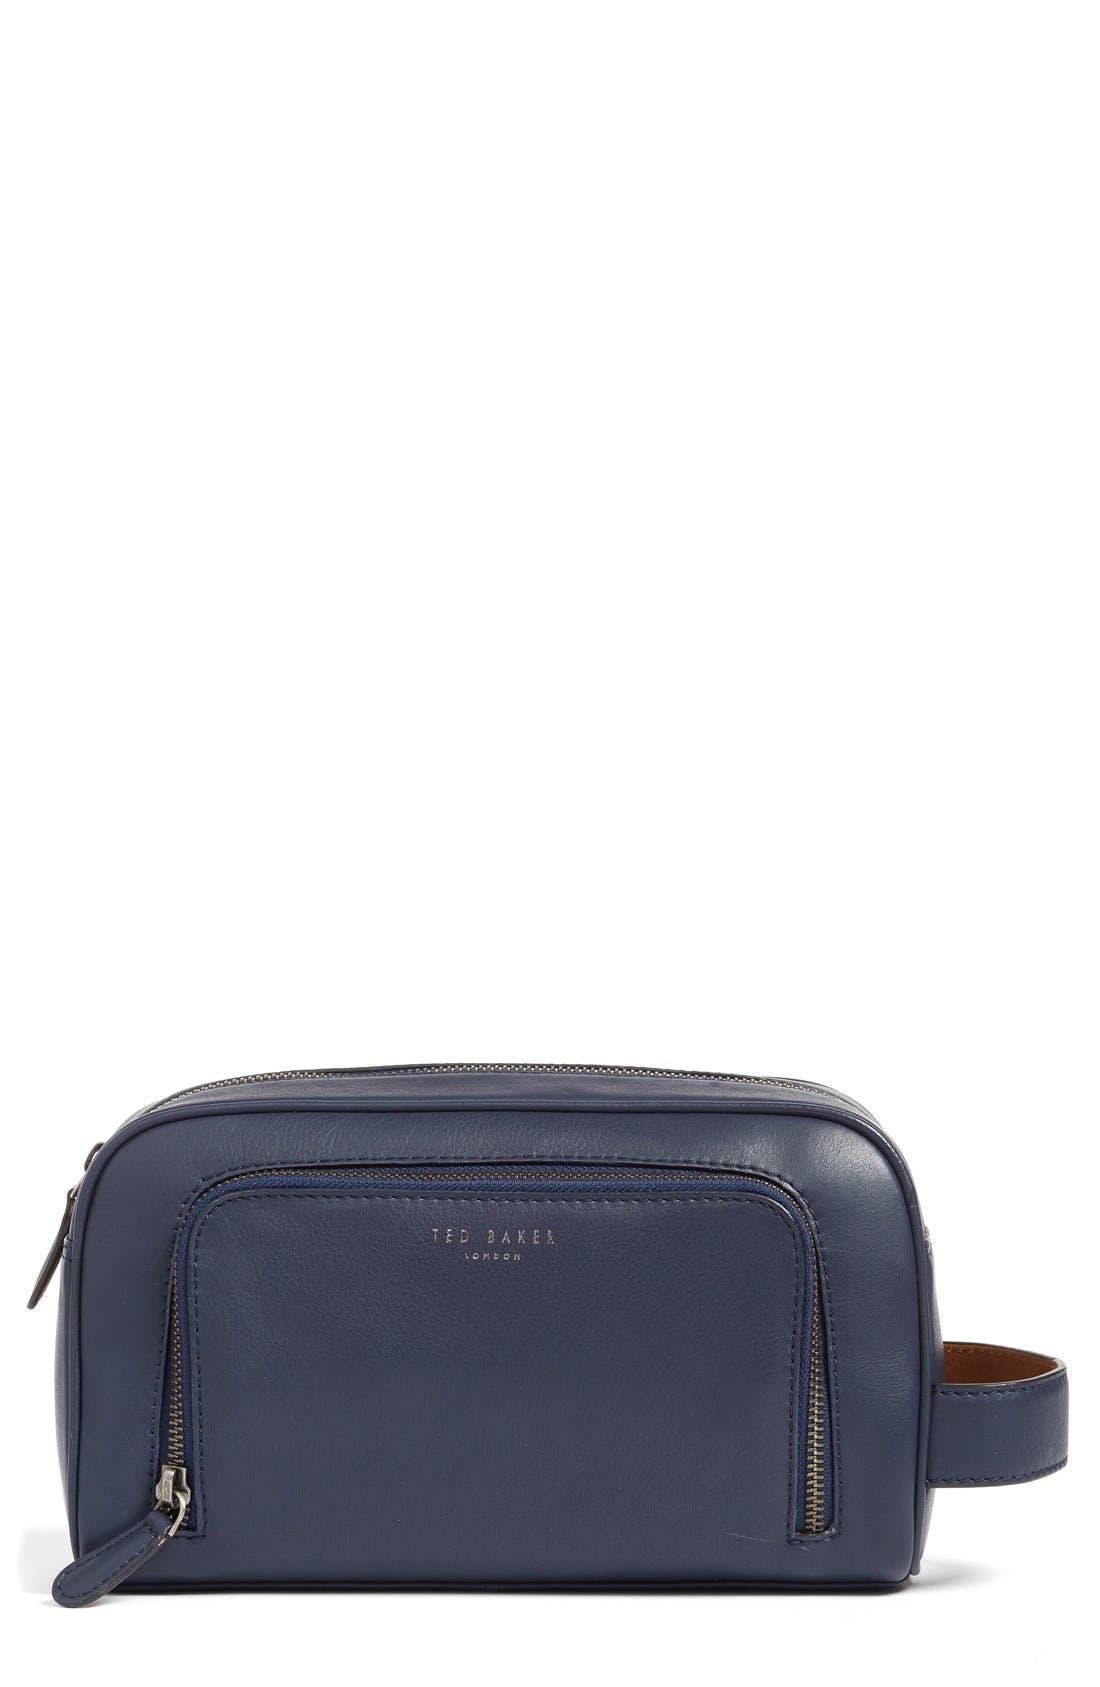 'Footsy' Leather Travel Kit,                             Main thumbnail 1, color,                             410